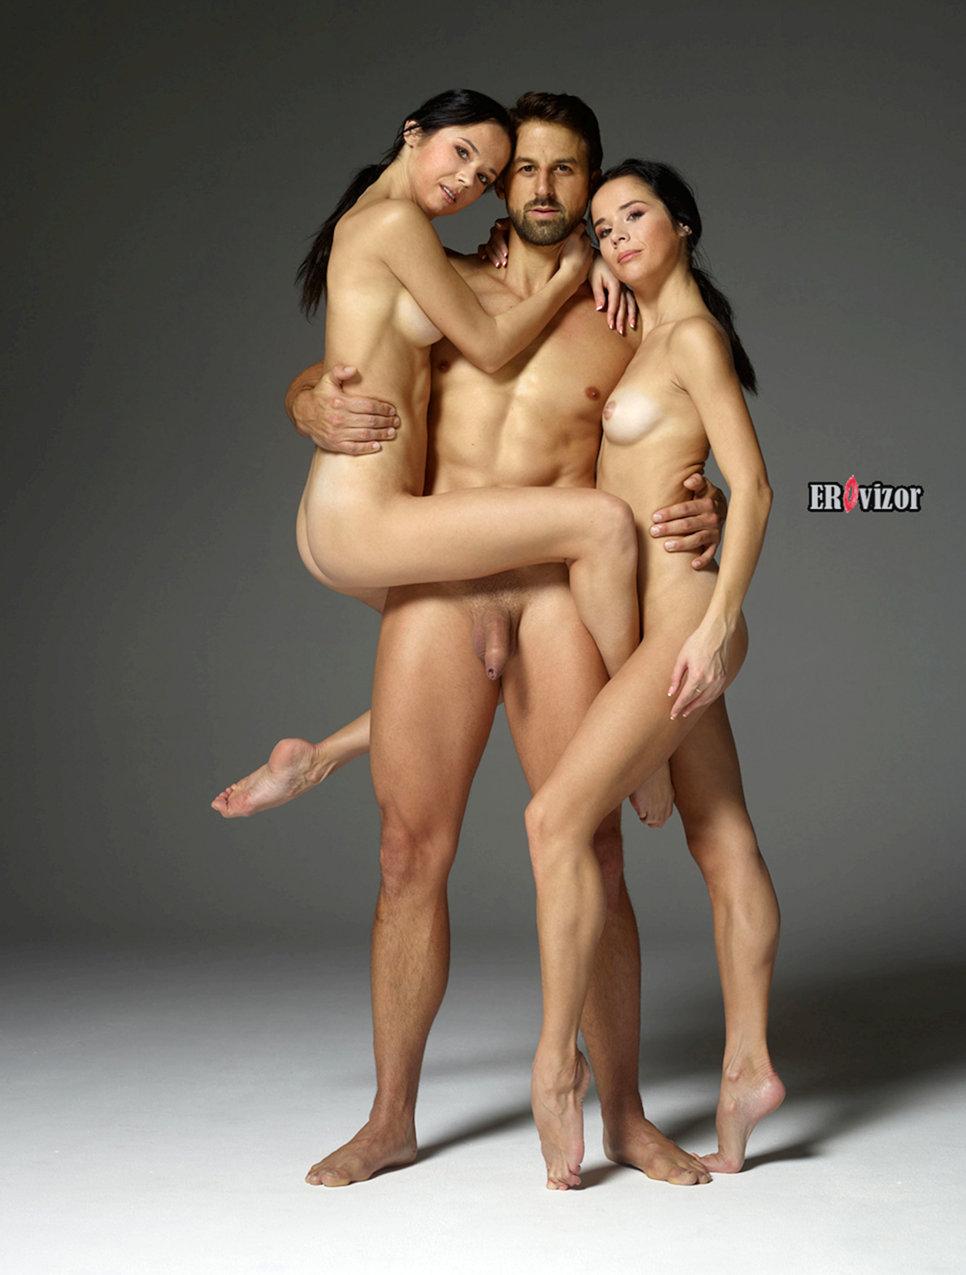 две девушки и мужчина в голом виде